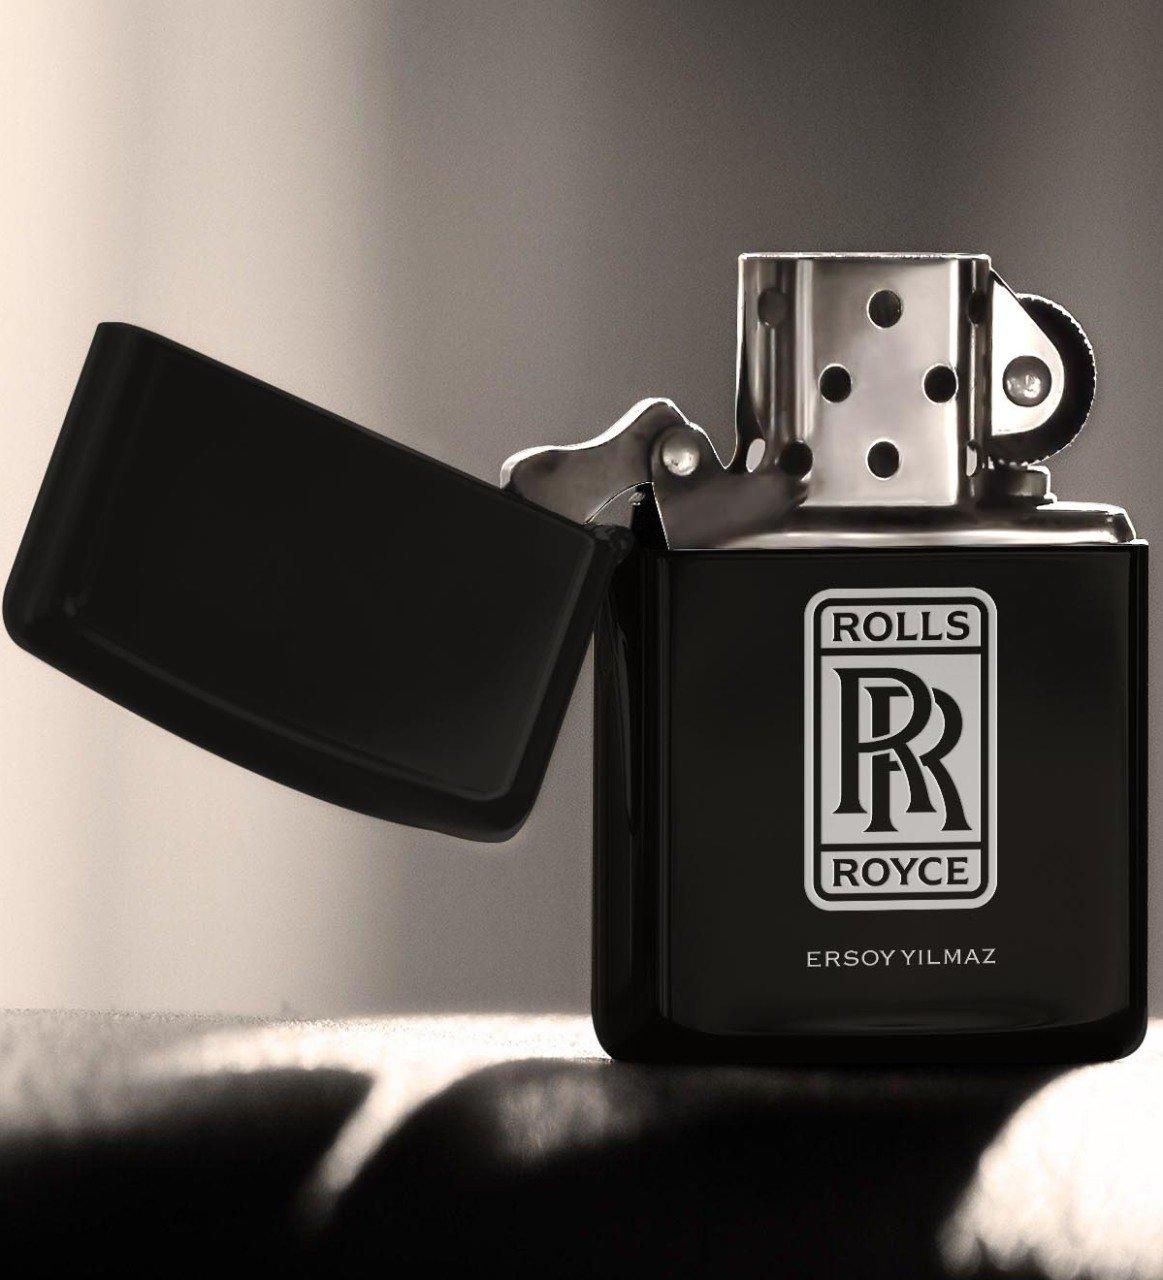 Personalized Rolls Royce Gasoline Black Metal Cigarette Lighter